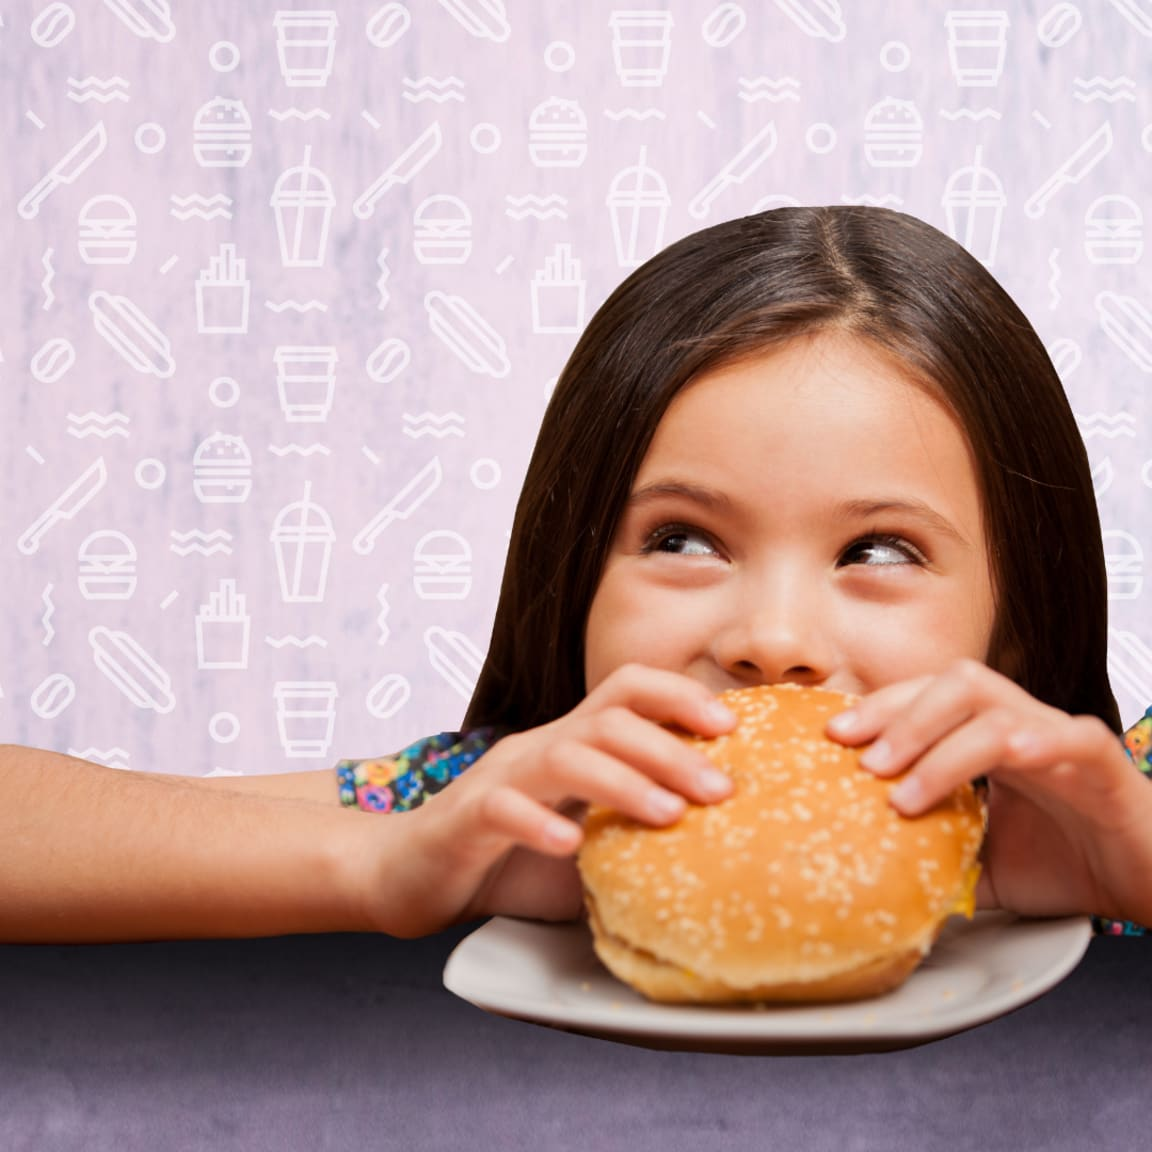 TGI Fridays: Kids eat free*